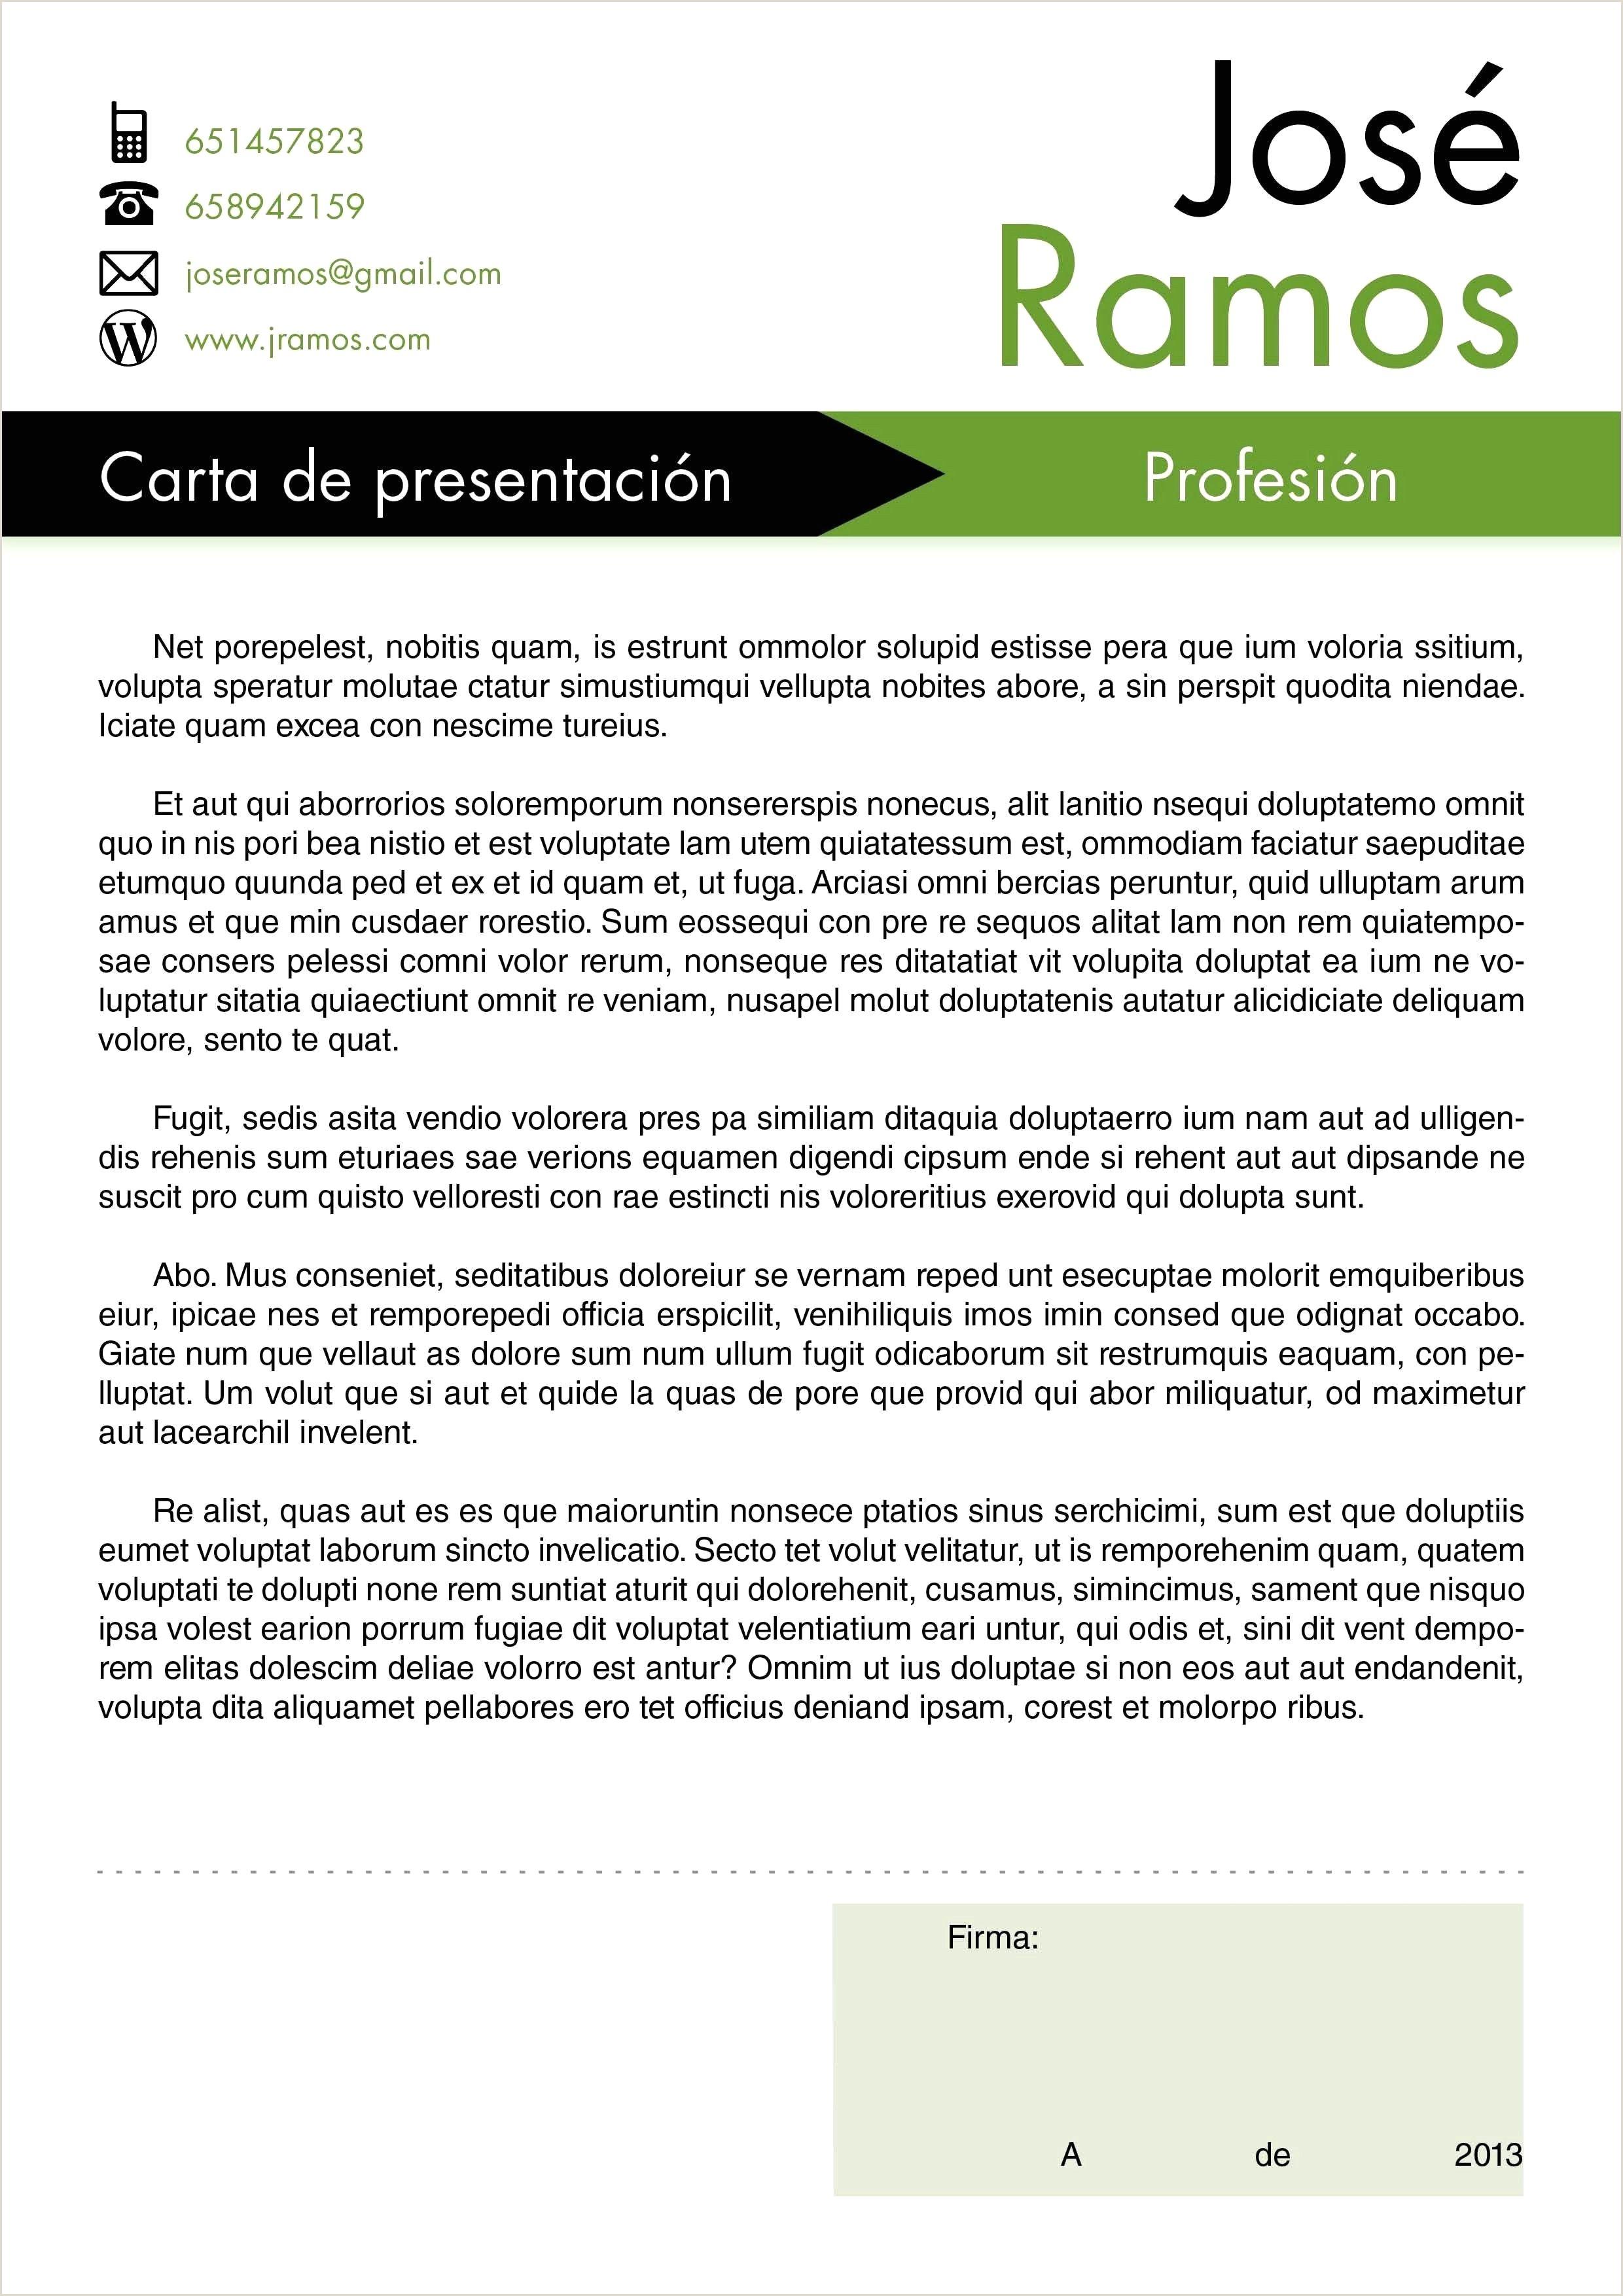 Curriculum Vitae Para Rellenar Argentina formato De Reconocimiento Para Editar Fresh Texto